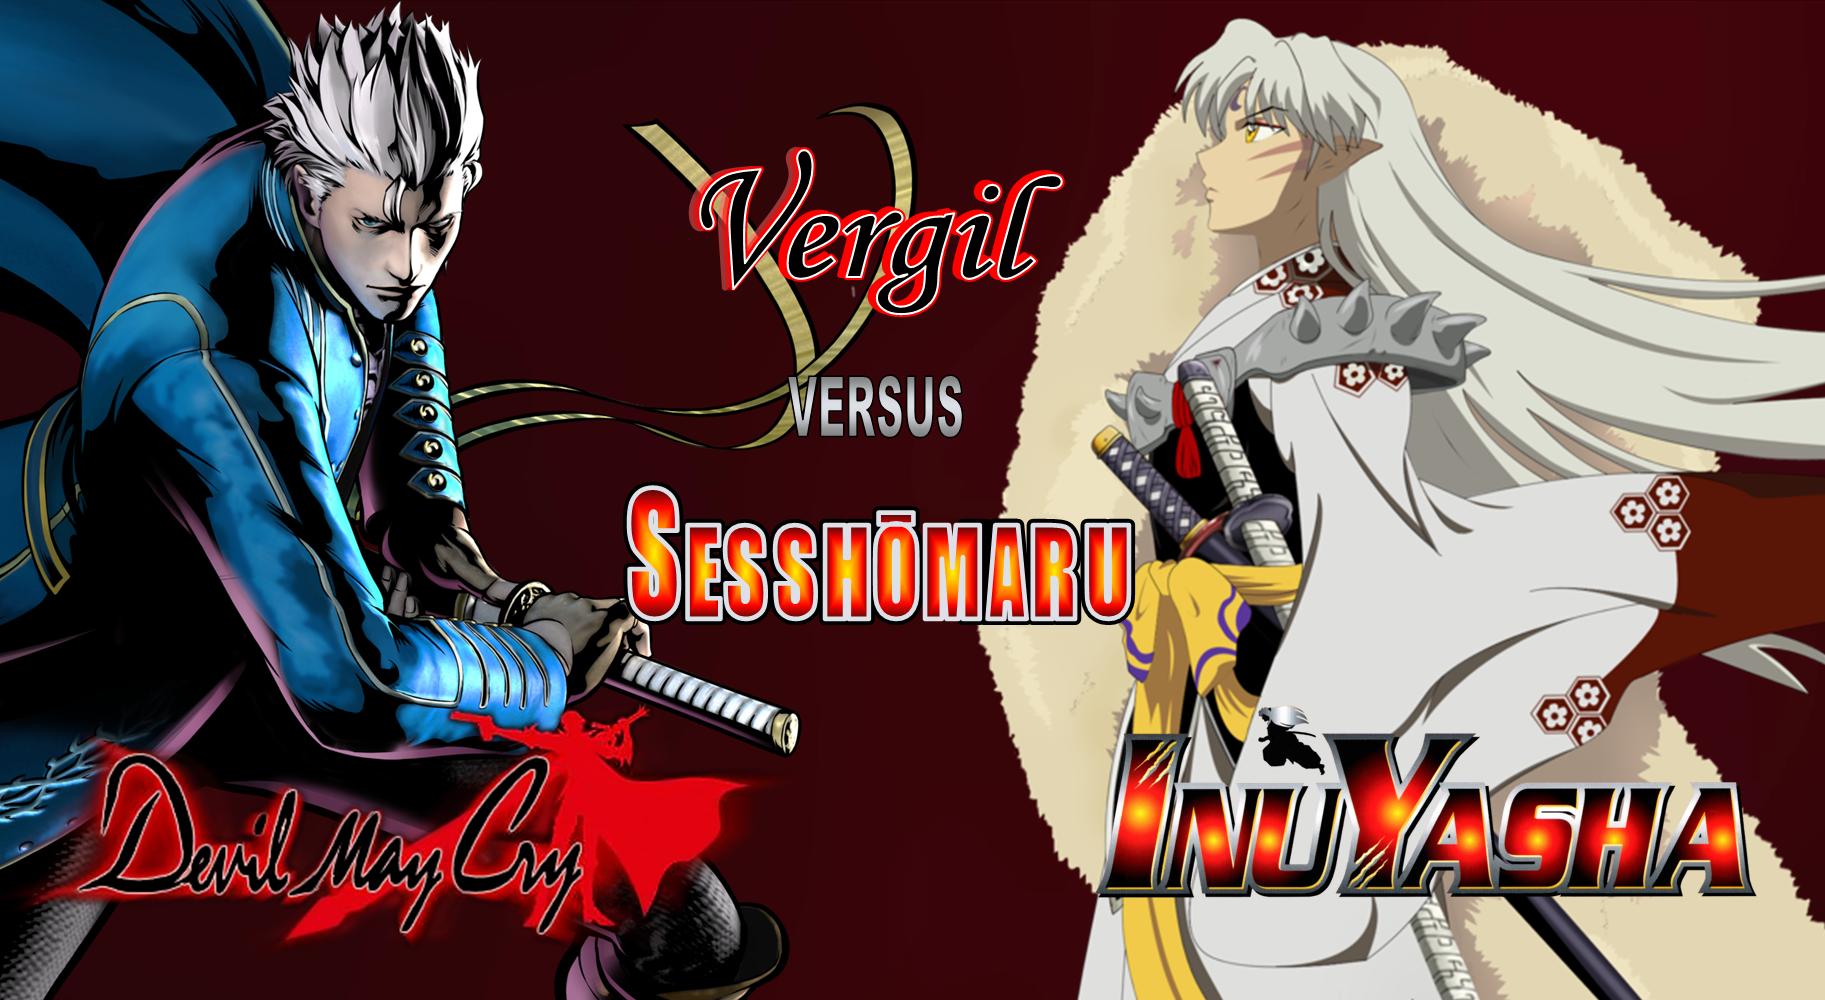 2330888-1487408790808-Vergil_versus_Sess